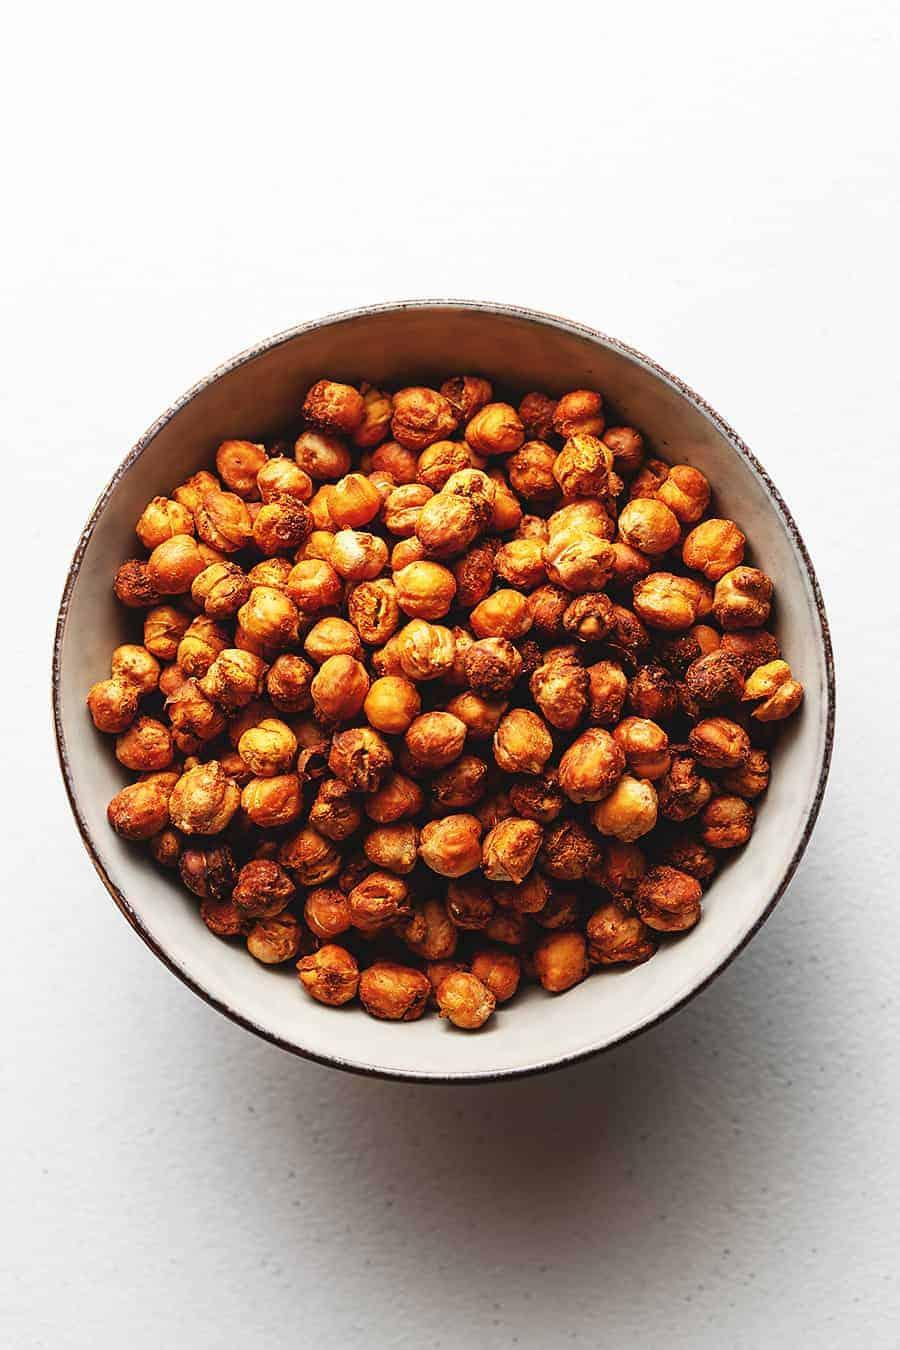 crispy air-fryer chickpeas in a bowl.